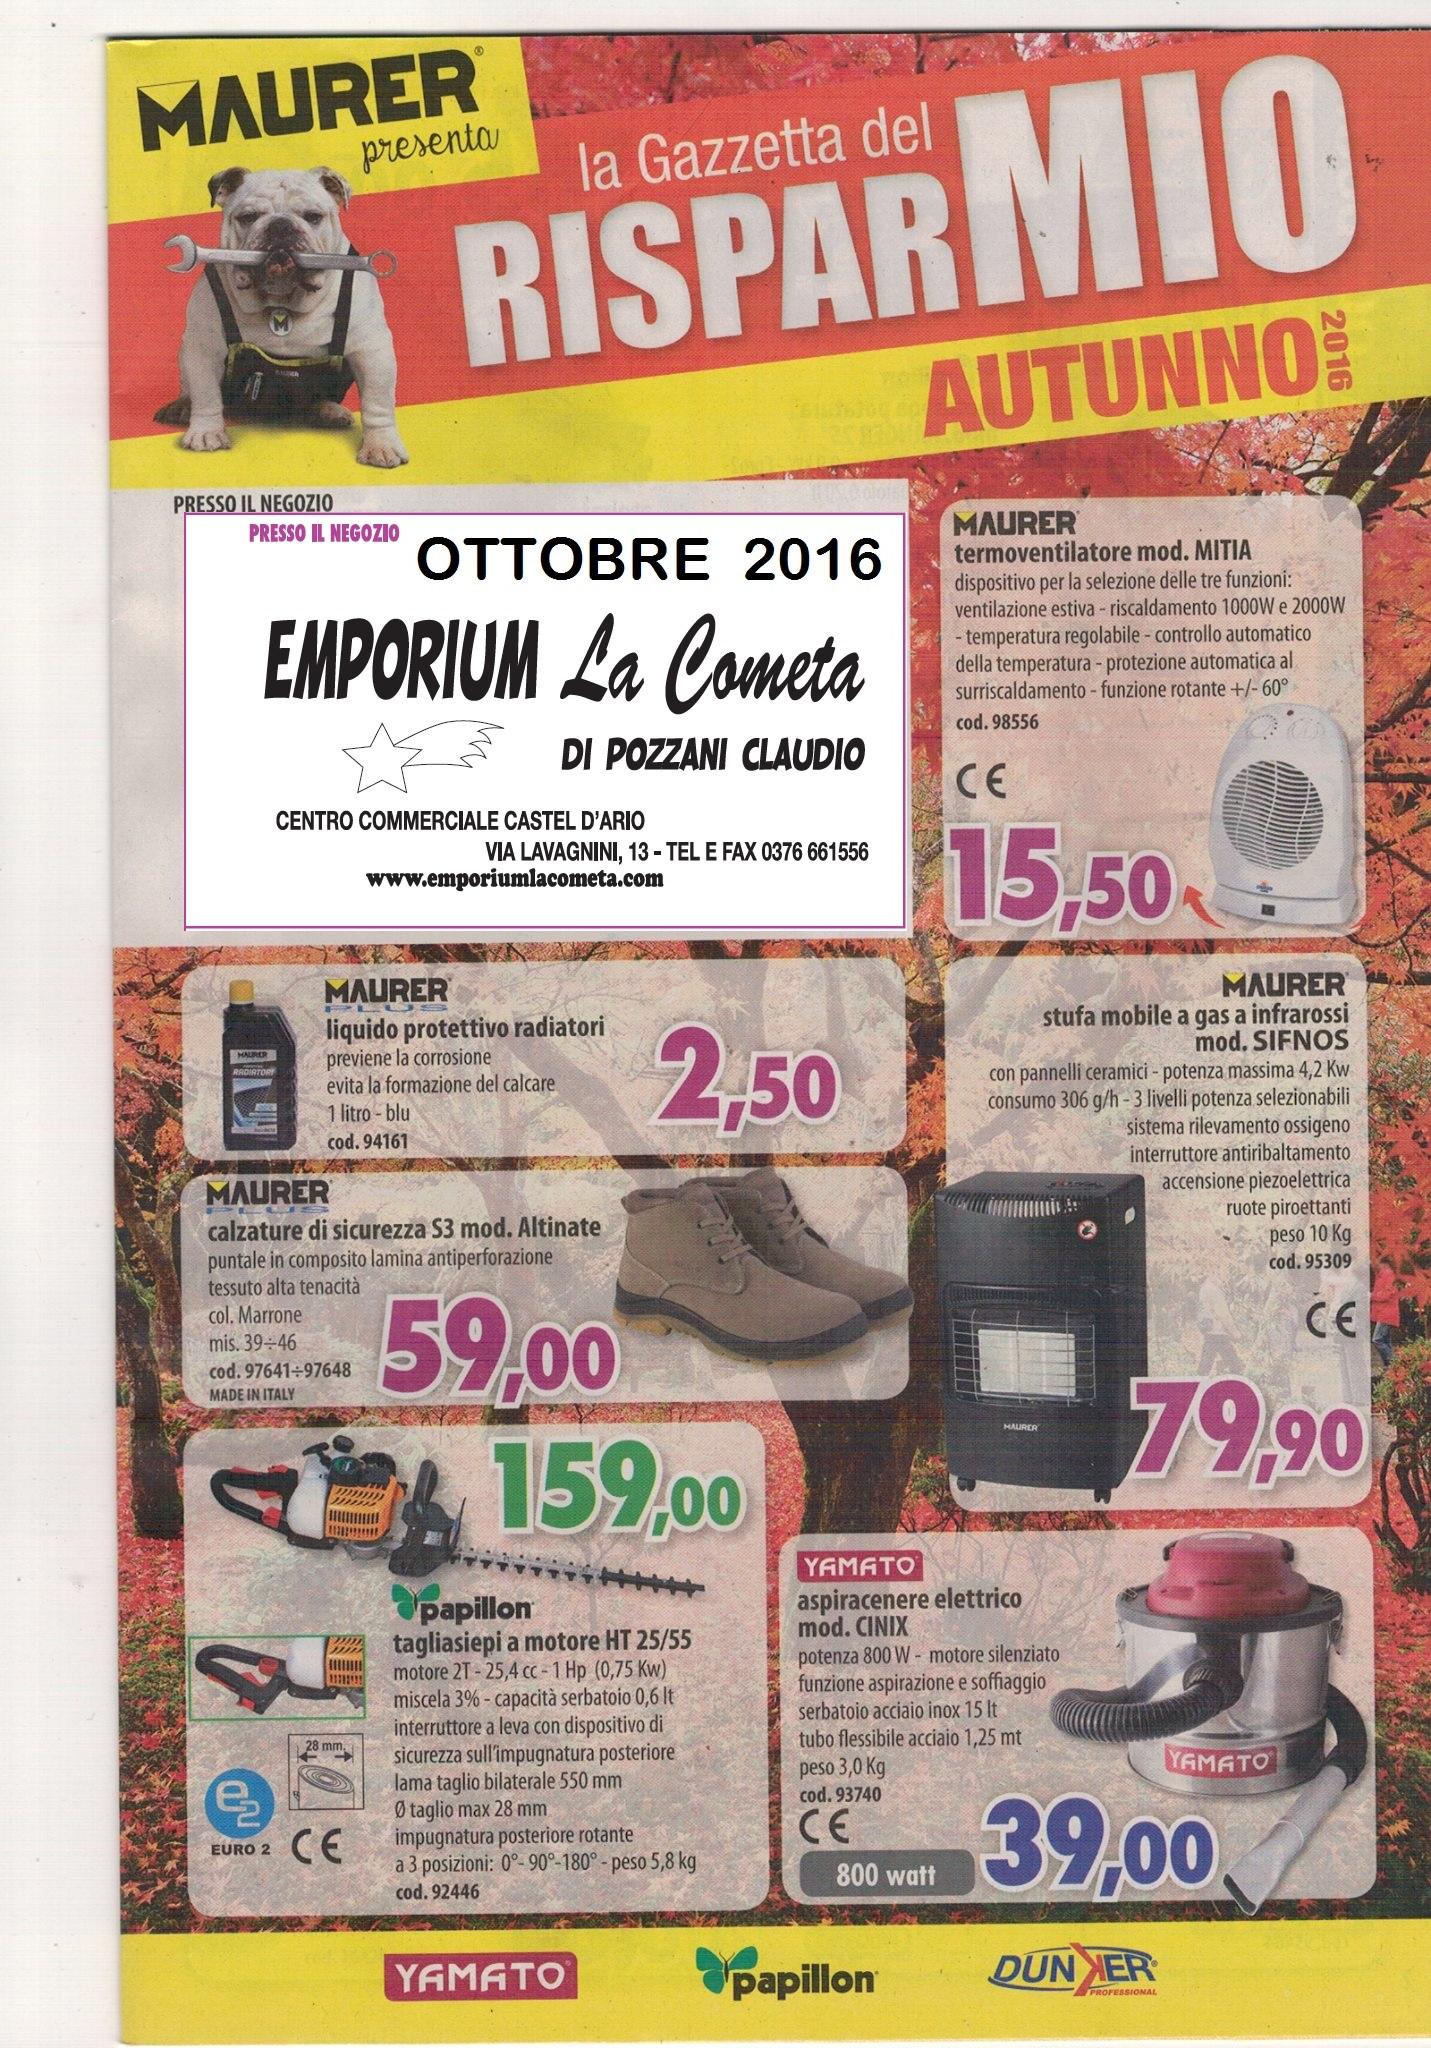 gazzetta-autunno-2016-pag-1.jpg